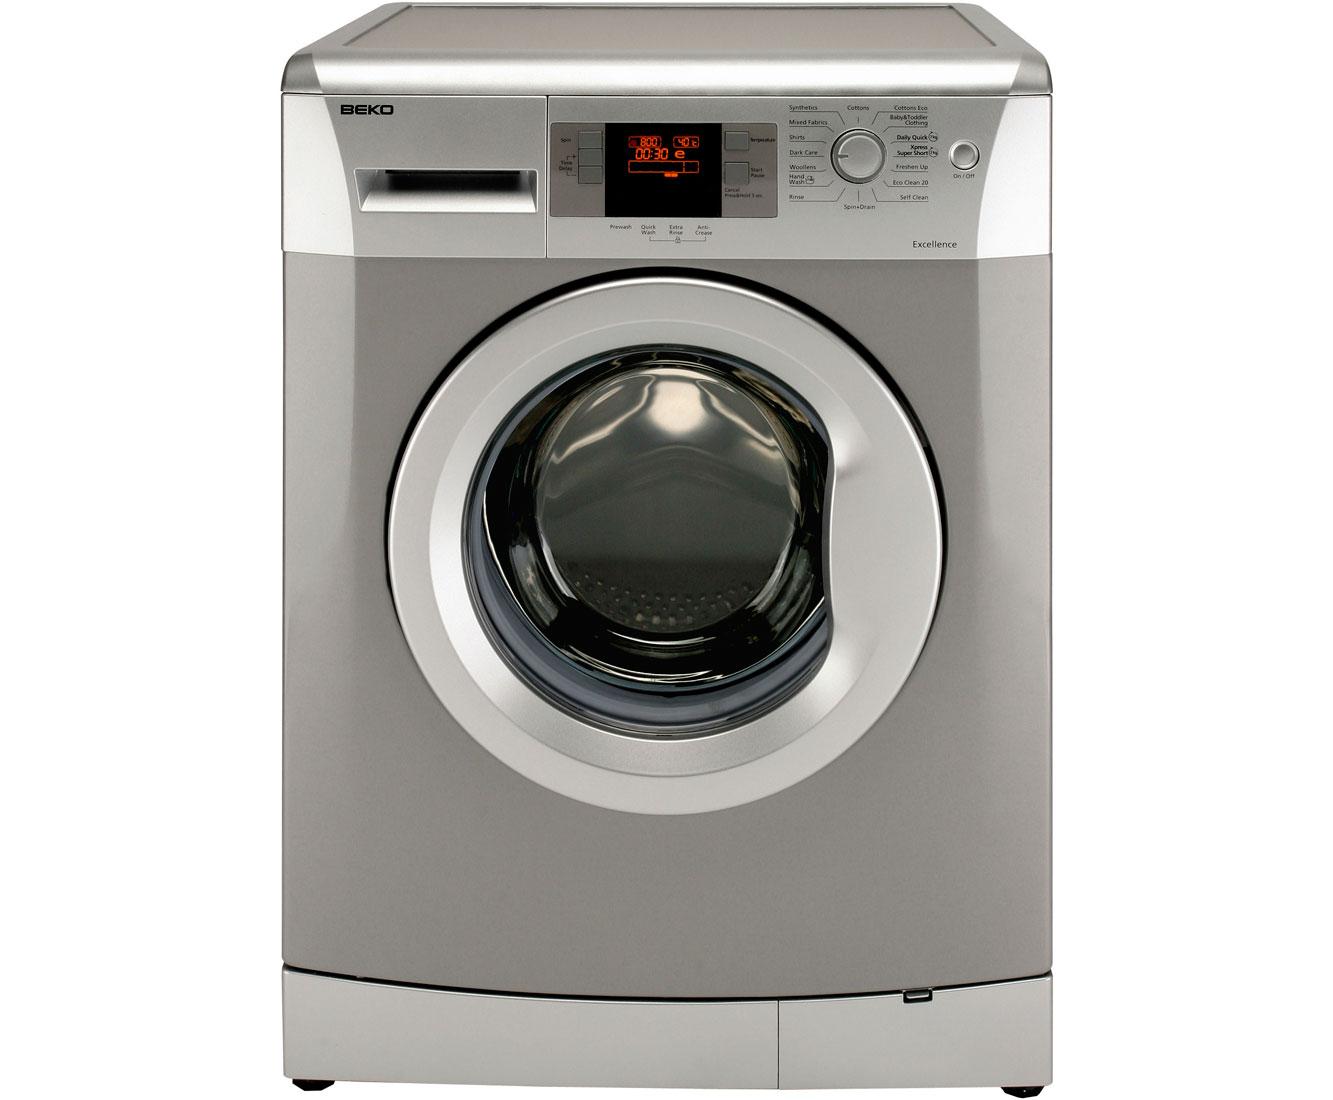 beko wmb714422 7kg washing machine silver 90590 ebay. Black Bedroom Furniture Sets. Home Design Ideas